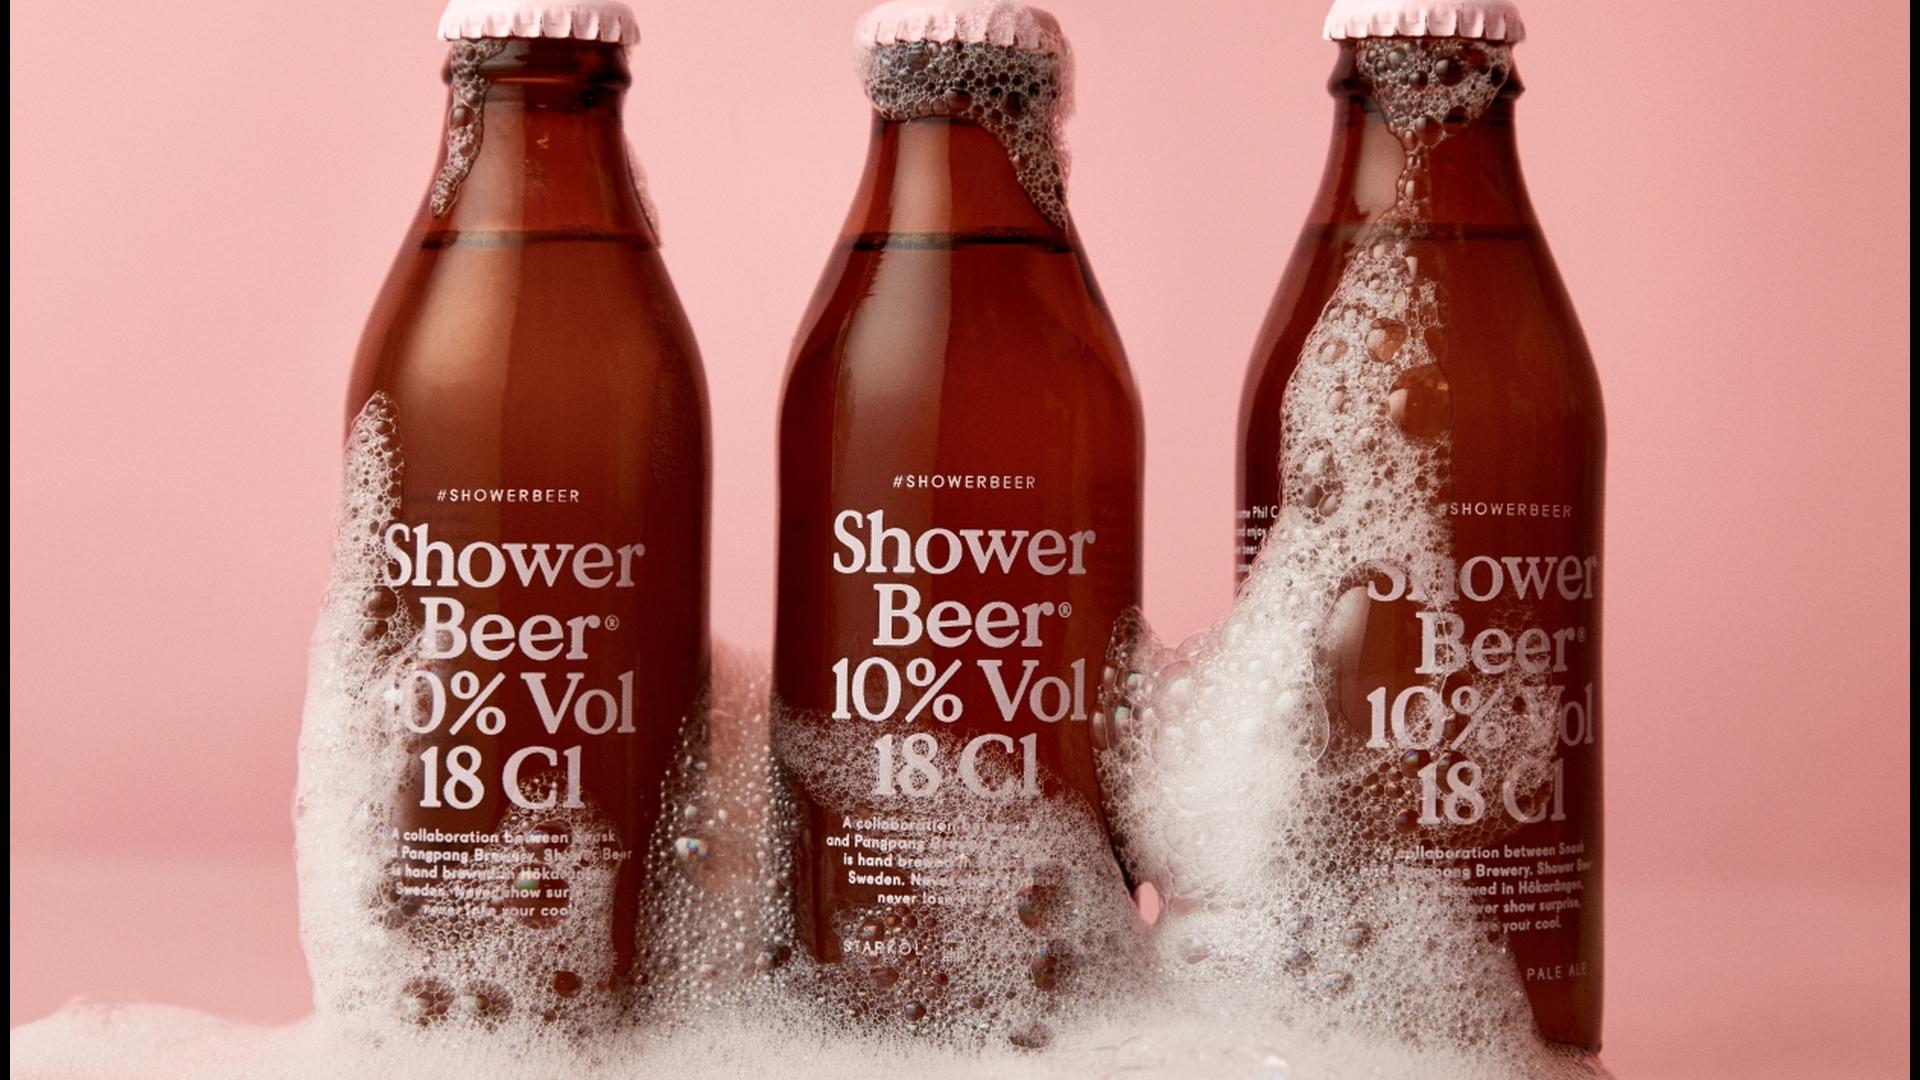 shower-beer_02_foam-3-1250x870.jpg